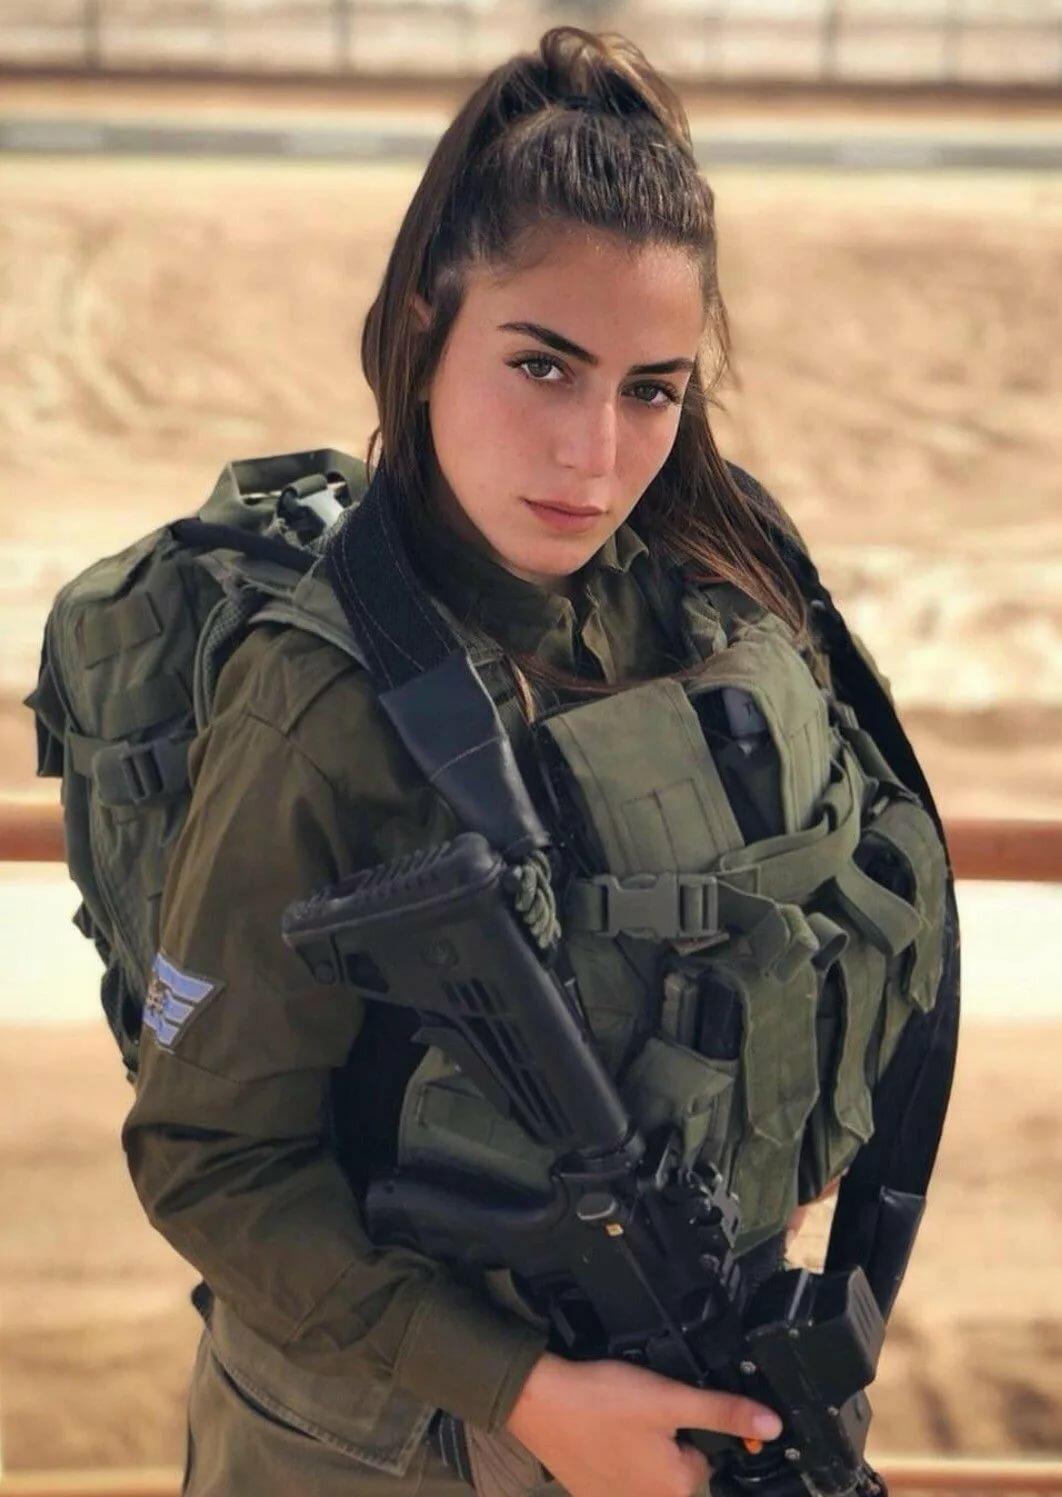 Women fuck army women iraq